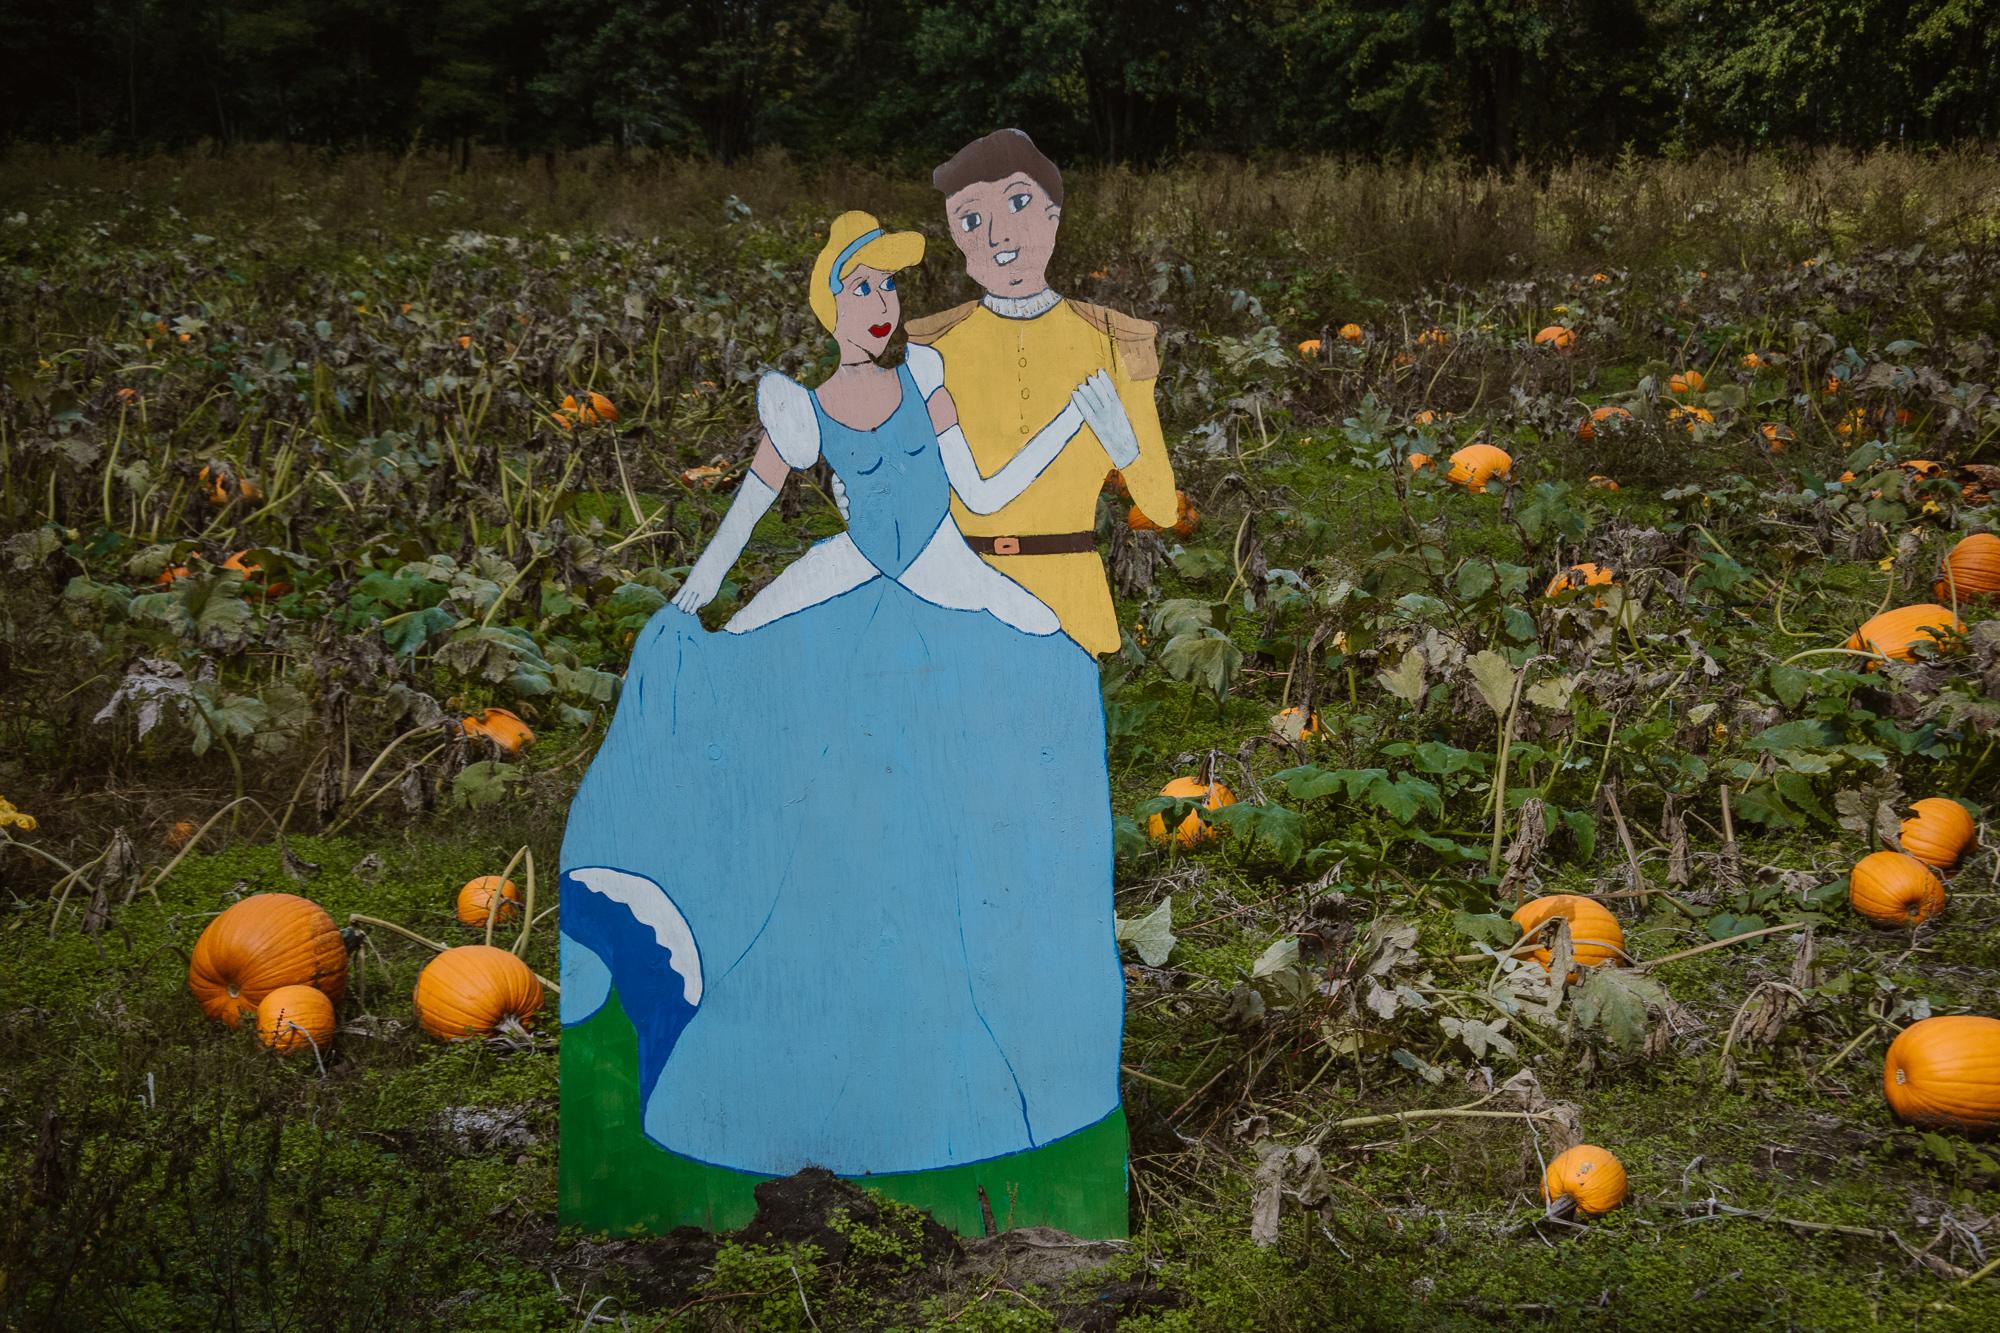 bethke-farms-pumpkin-patch-grand-haven-michigan (7).jpg